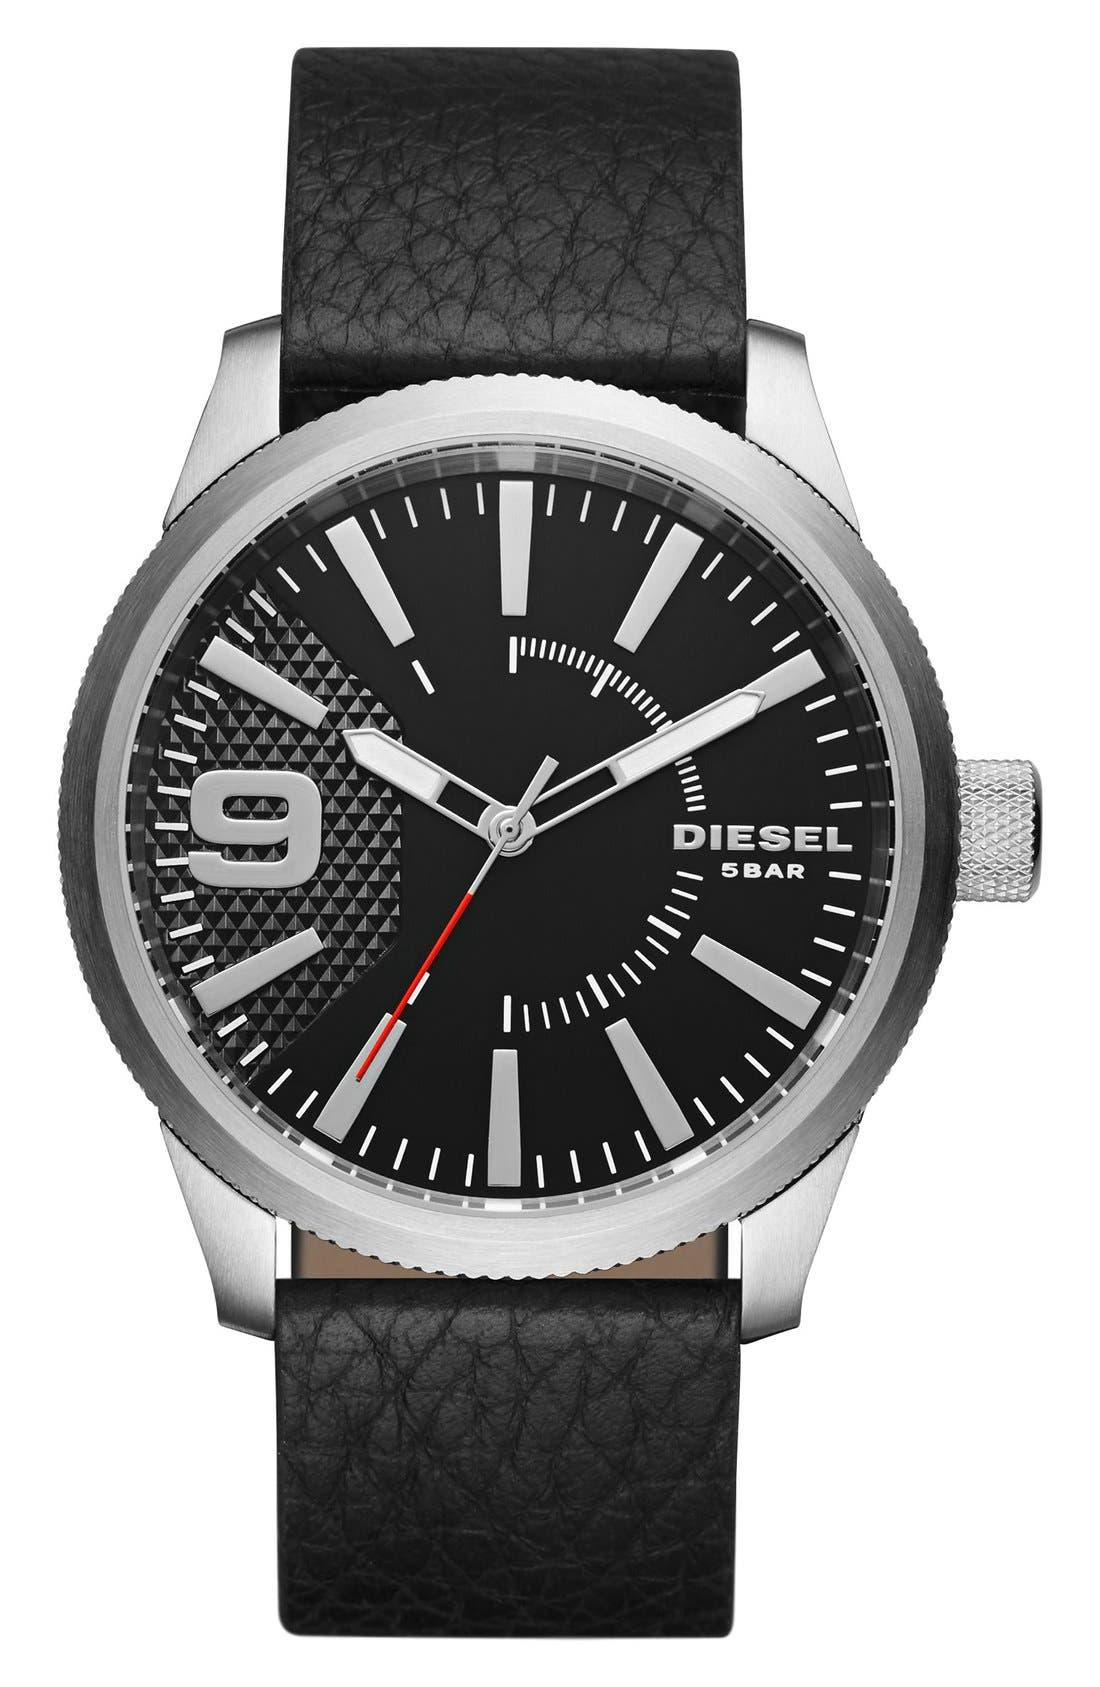 DIESEL® 'Rasp' Leather Strap Watch, 46mm